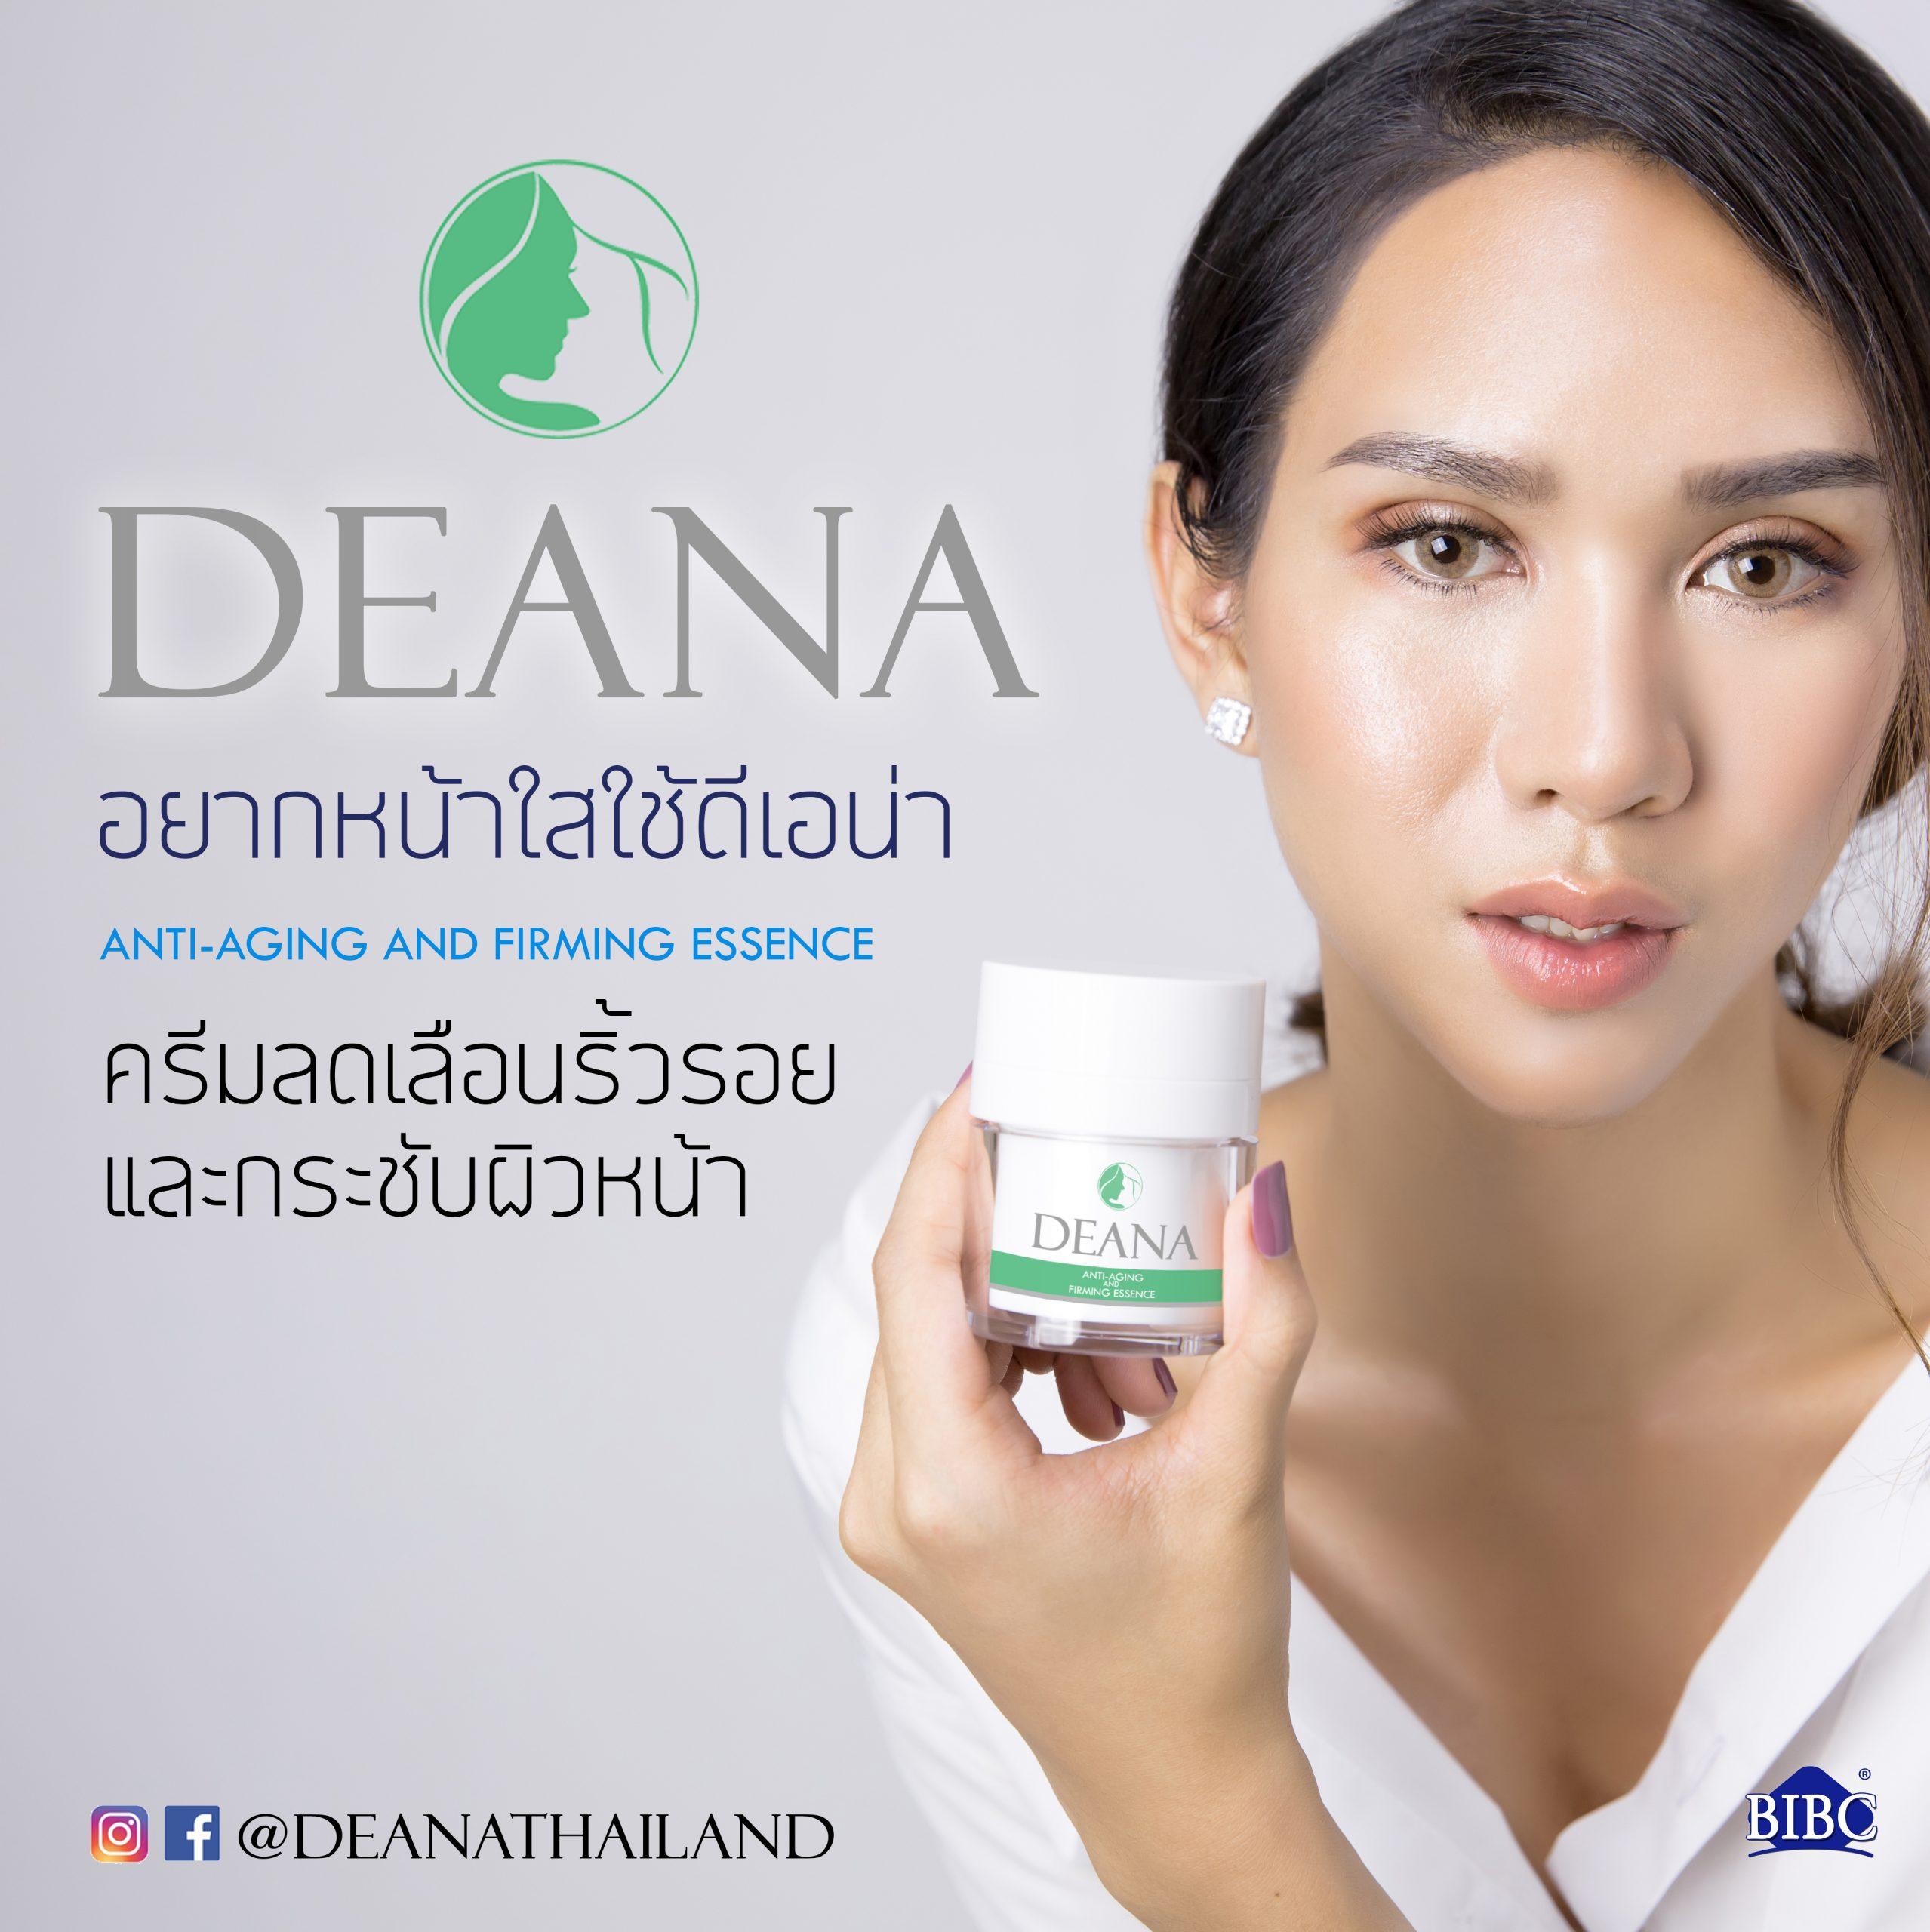 Deana ads ไม่มีเบอร์